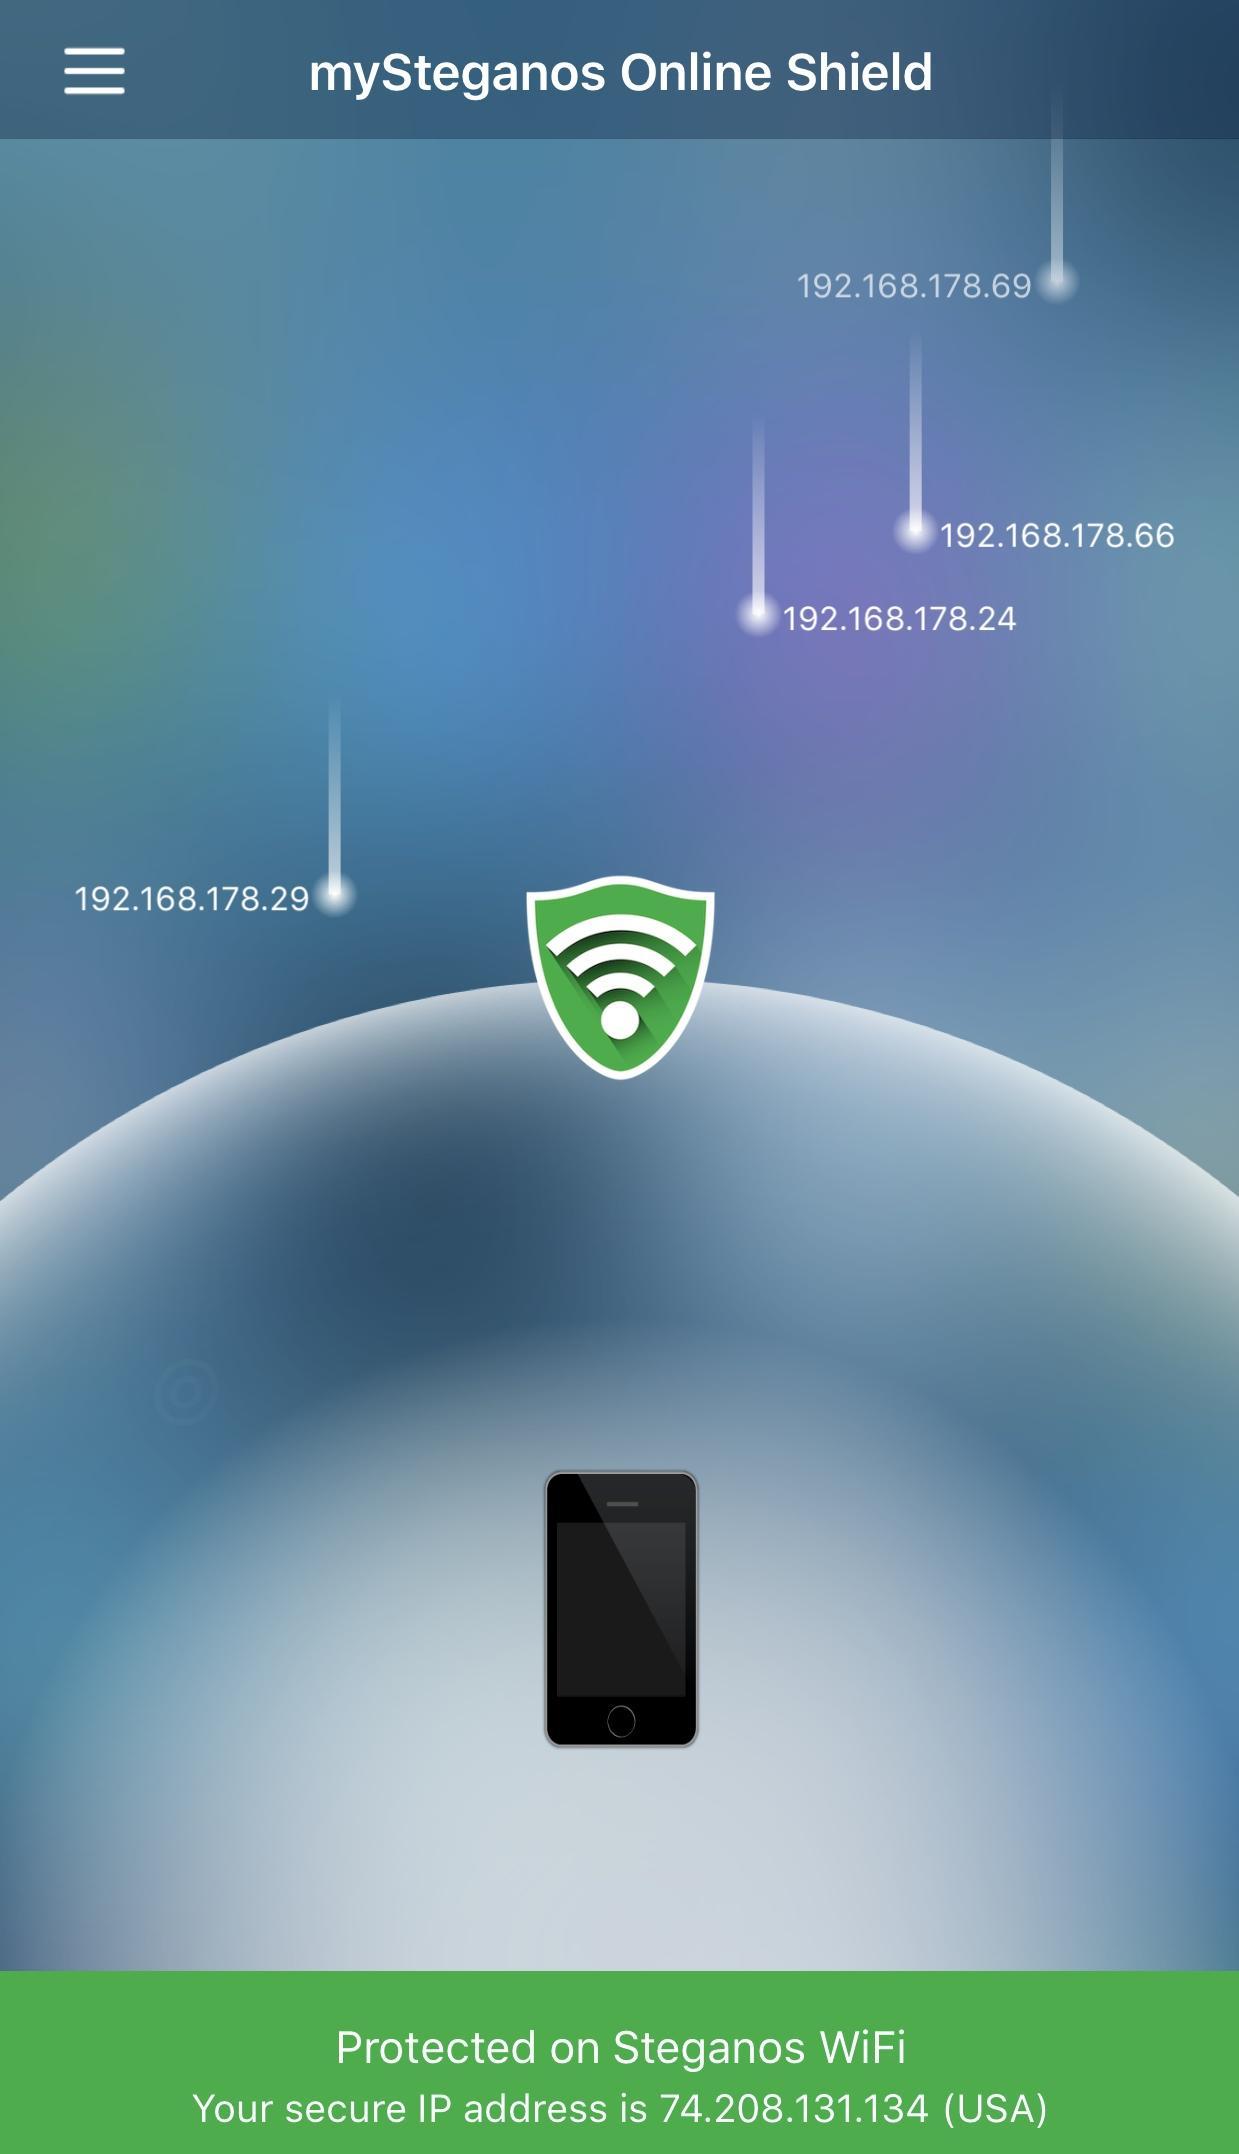 steganos-online-shield-vpn_4_348802.jpg